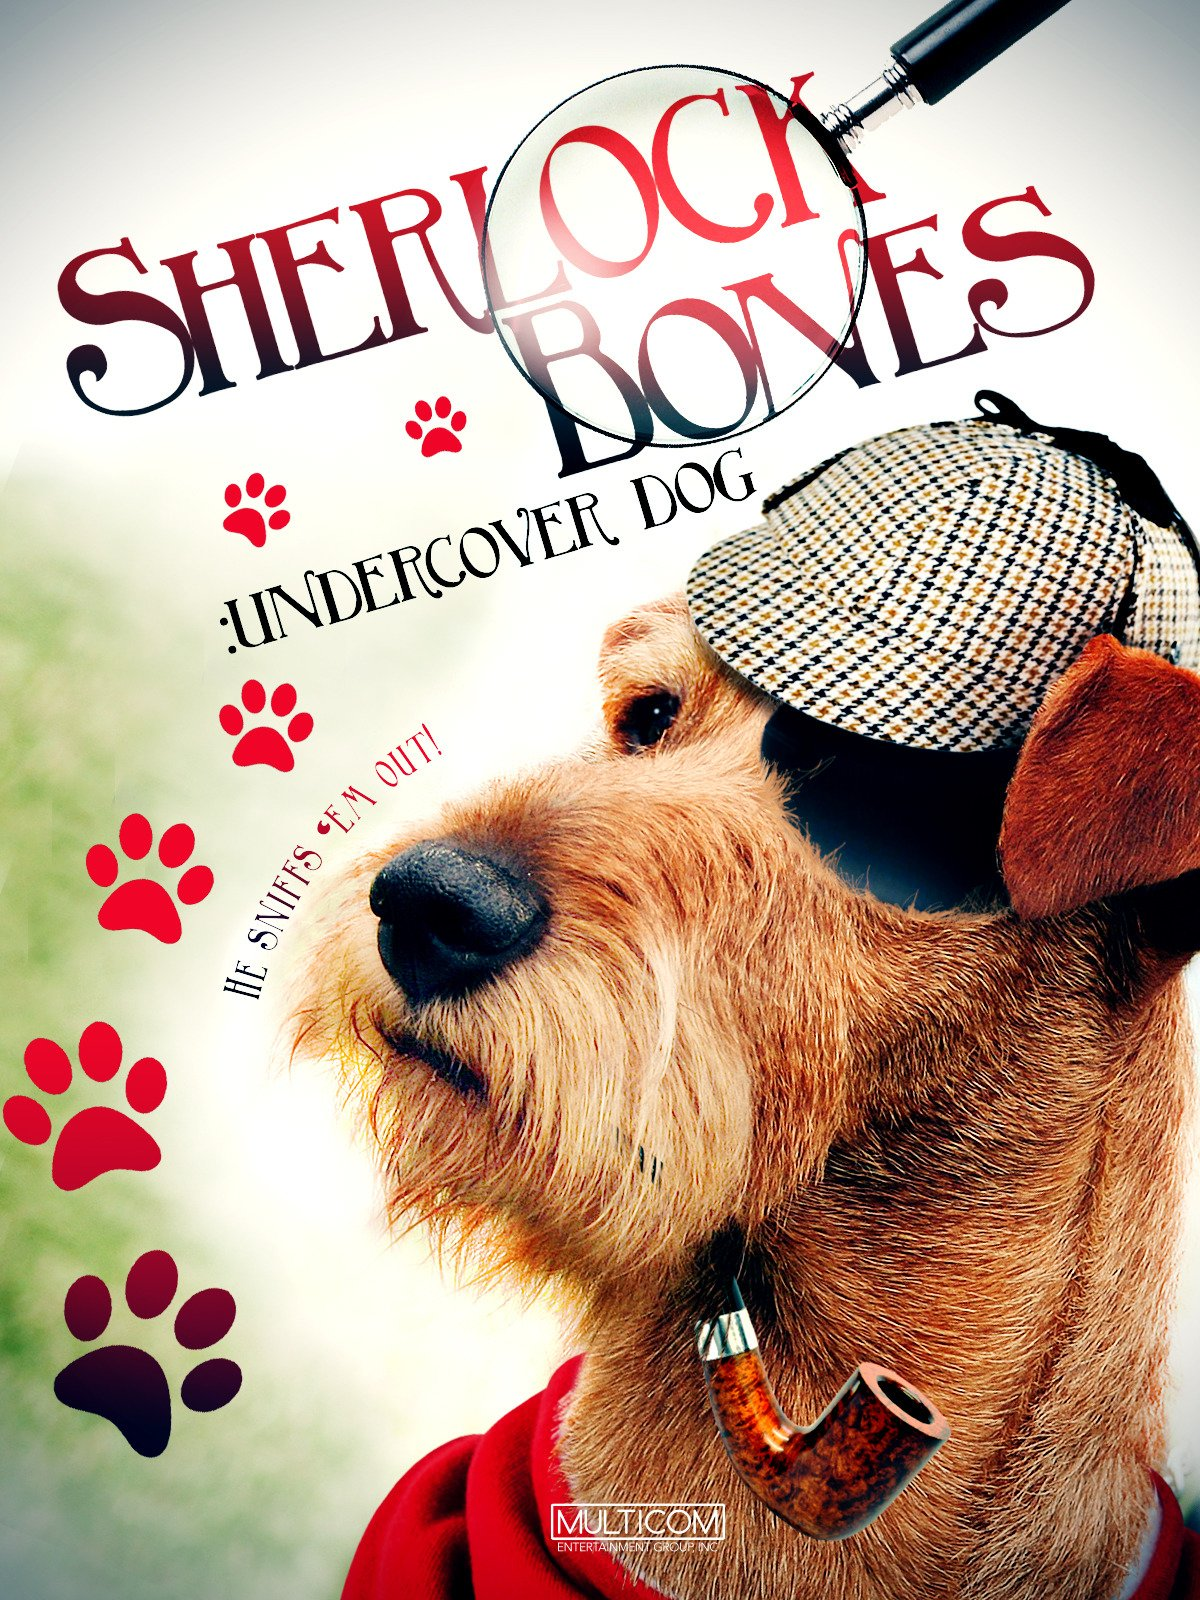 Sherlock Bones: Undercover Dog